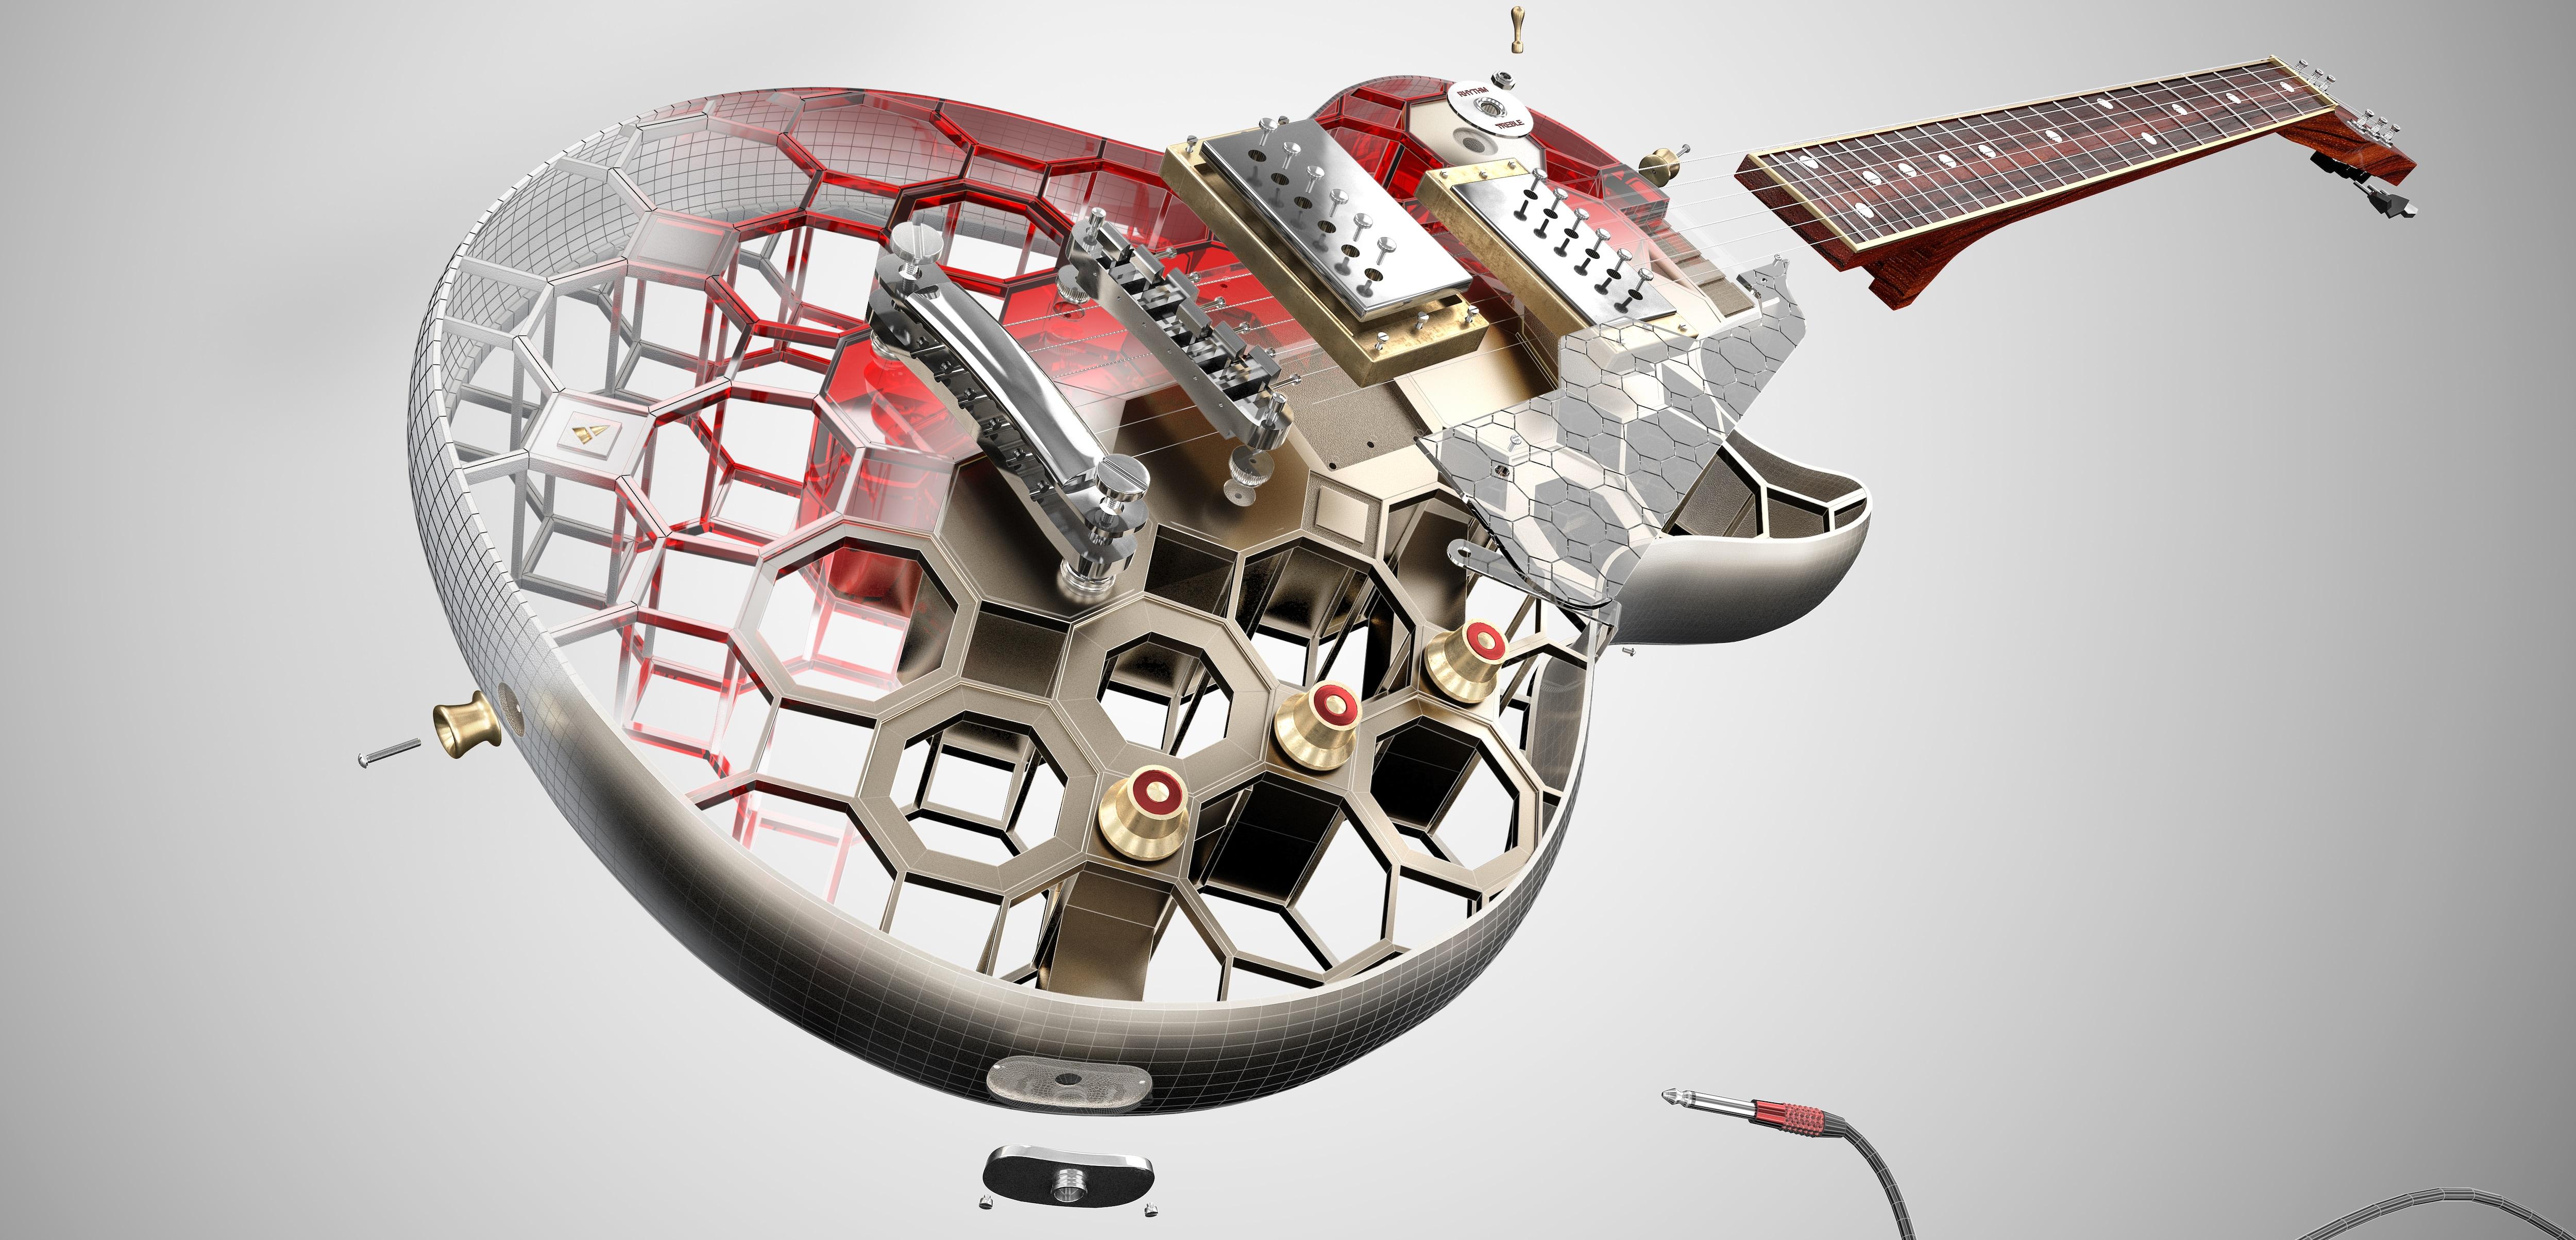 3D CAD Software | Inventor, AutoCAD, Revit | Autodesk